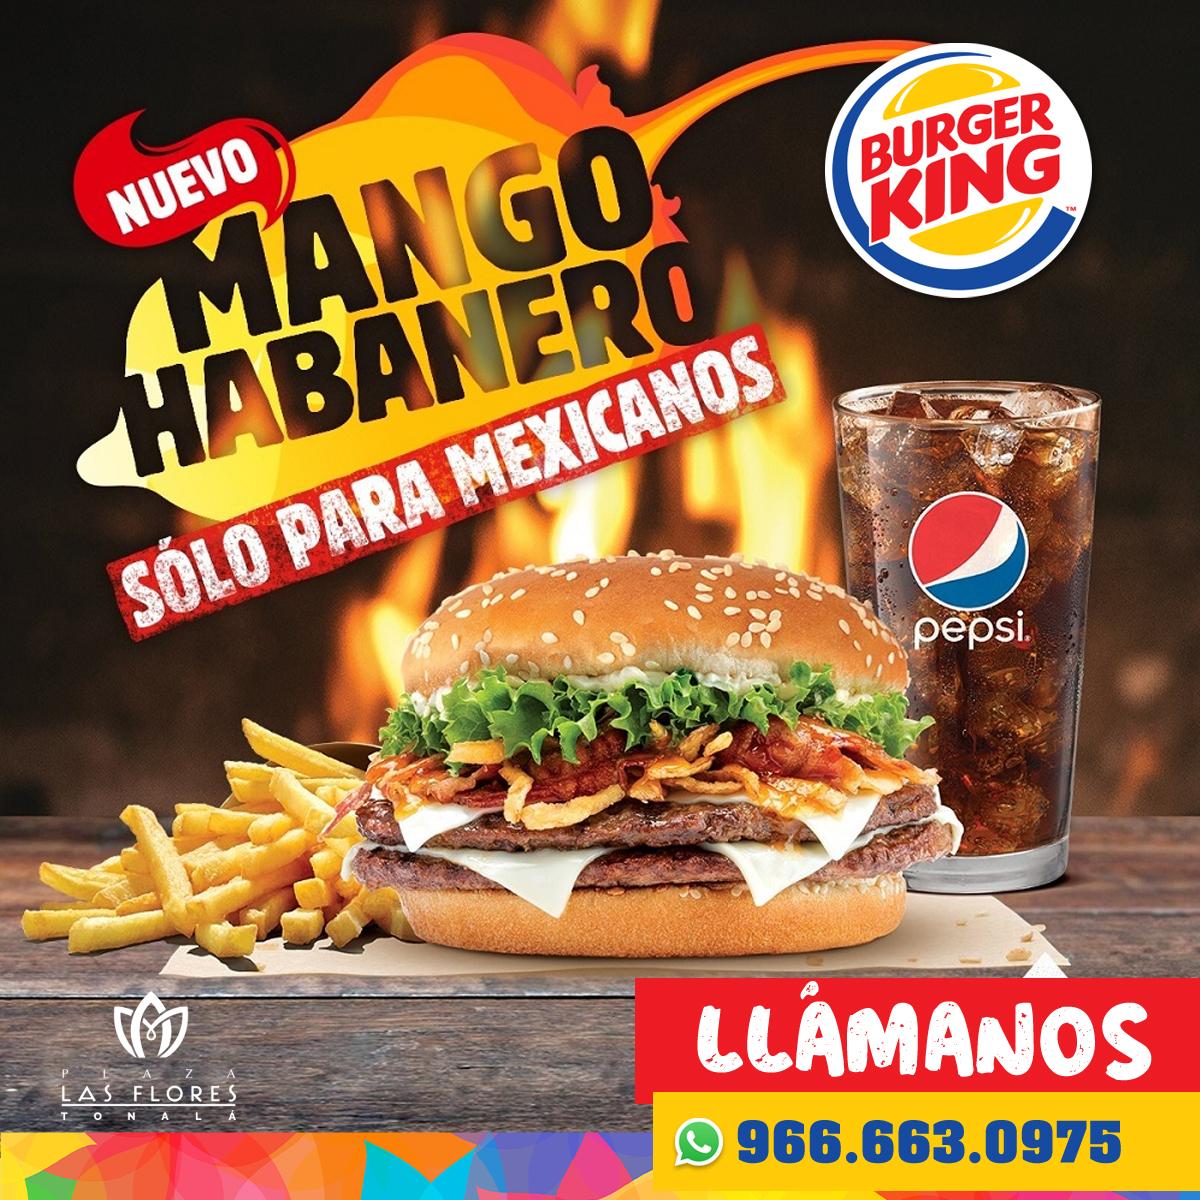 LasFlores-PromTonala-BurgerKing copy